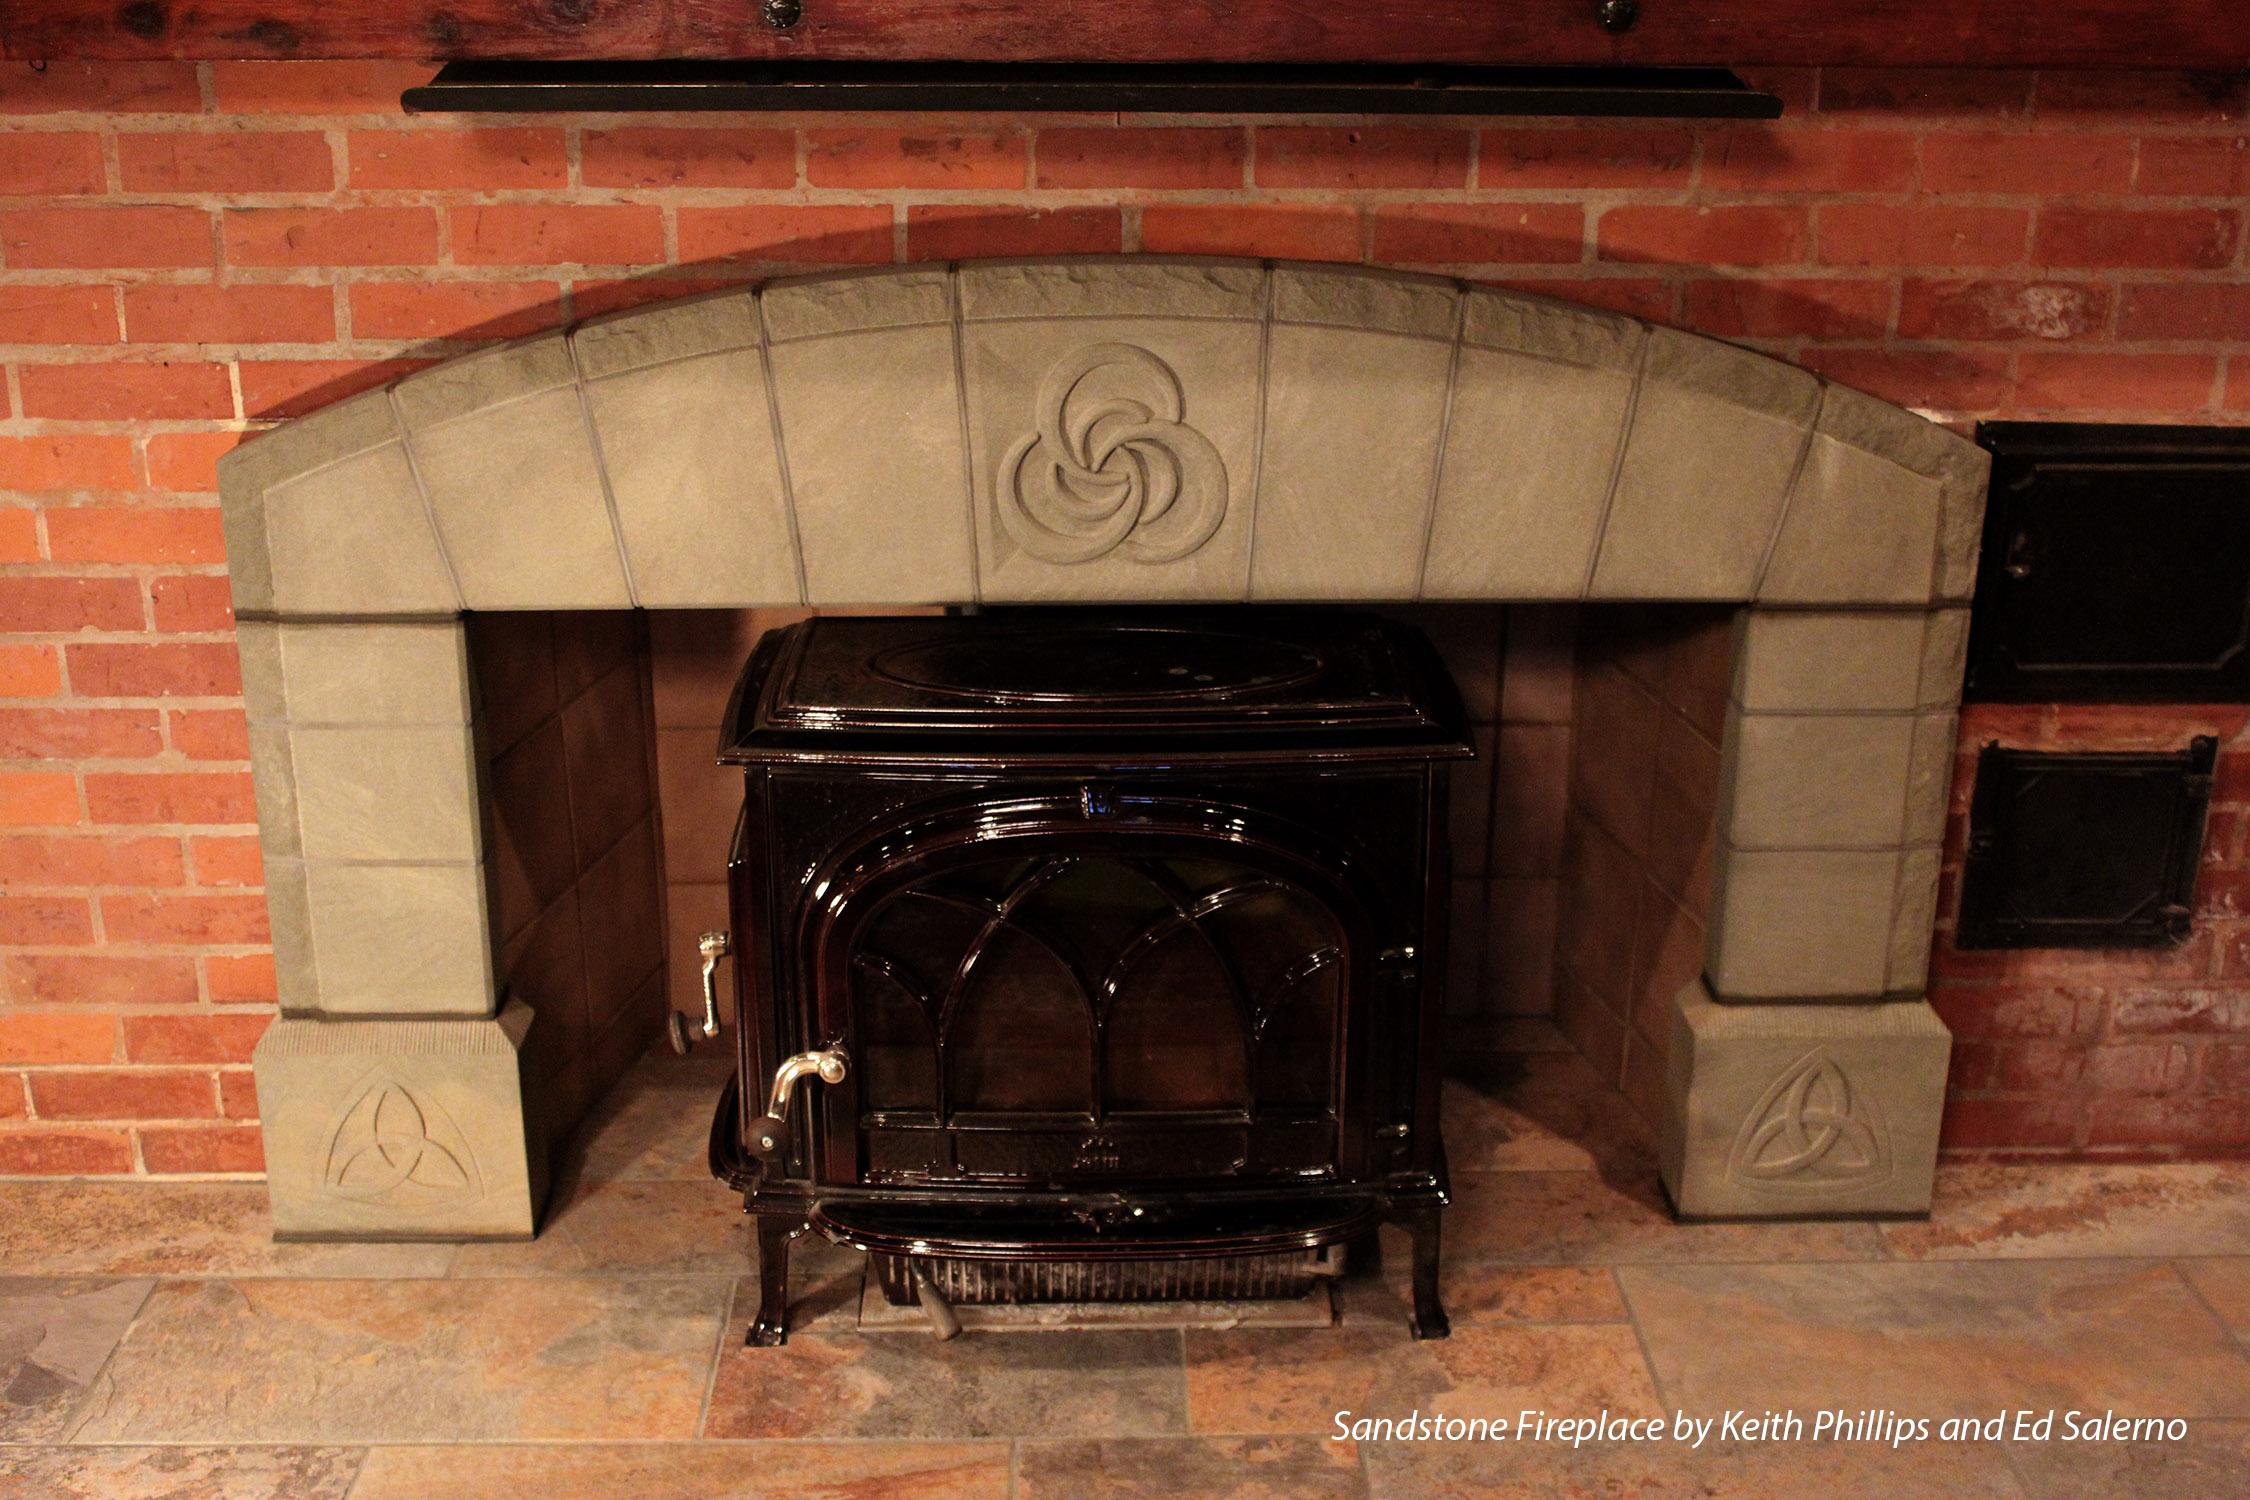 Sandstone_fireplace_02a.jpg